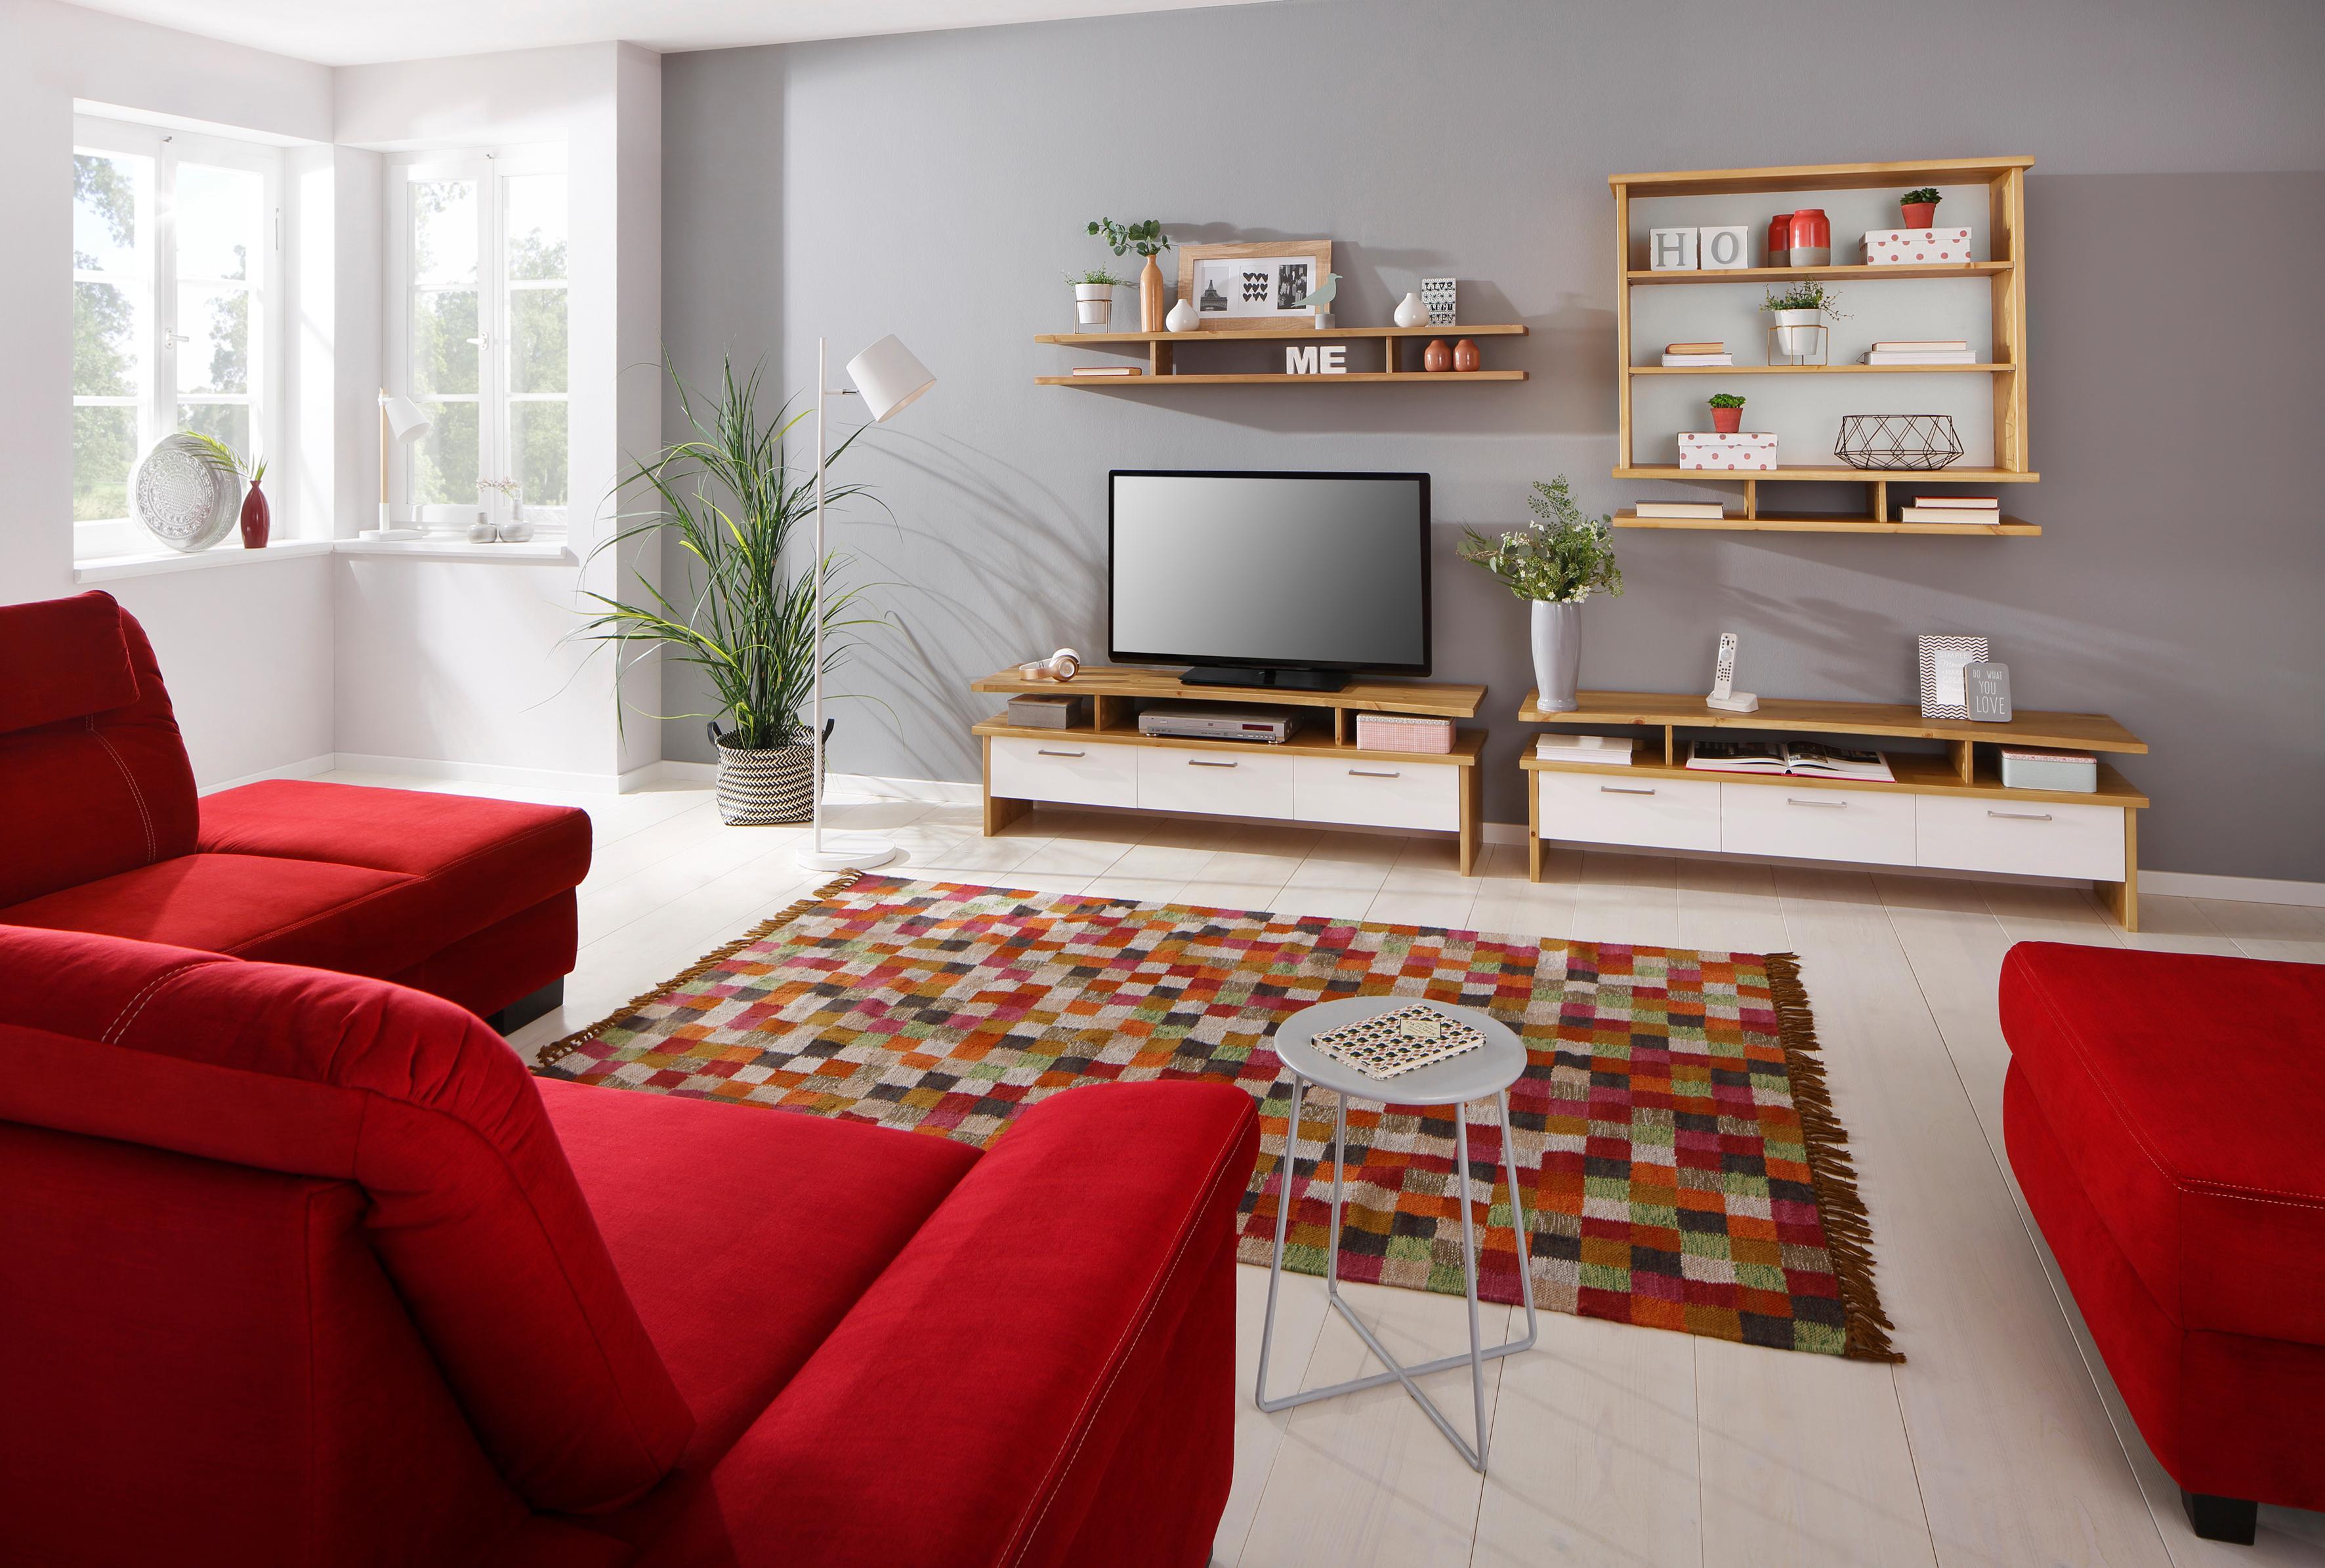 Home affaire Wohnwand »Ixo« aus massiver Kiefer, 4-tlg.